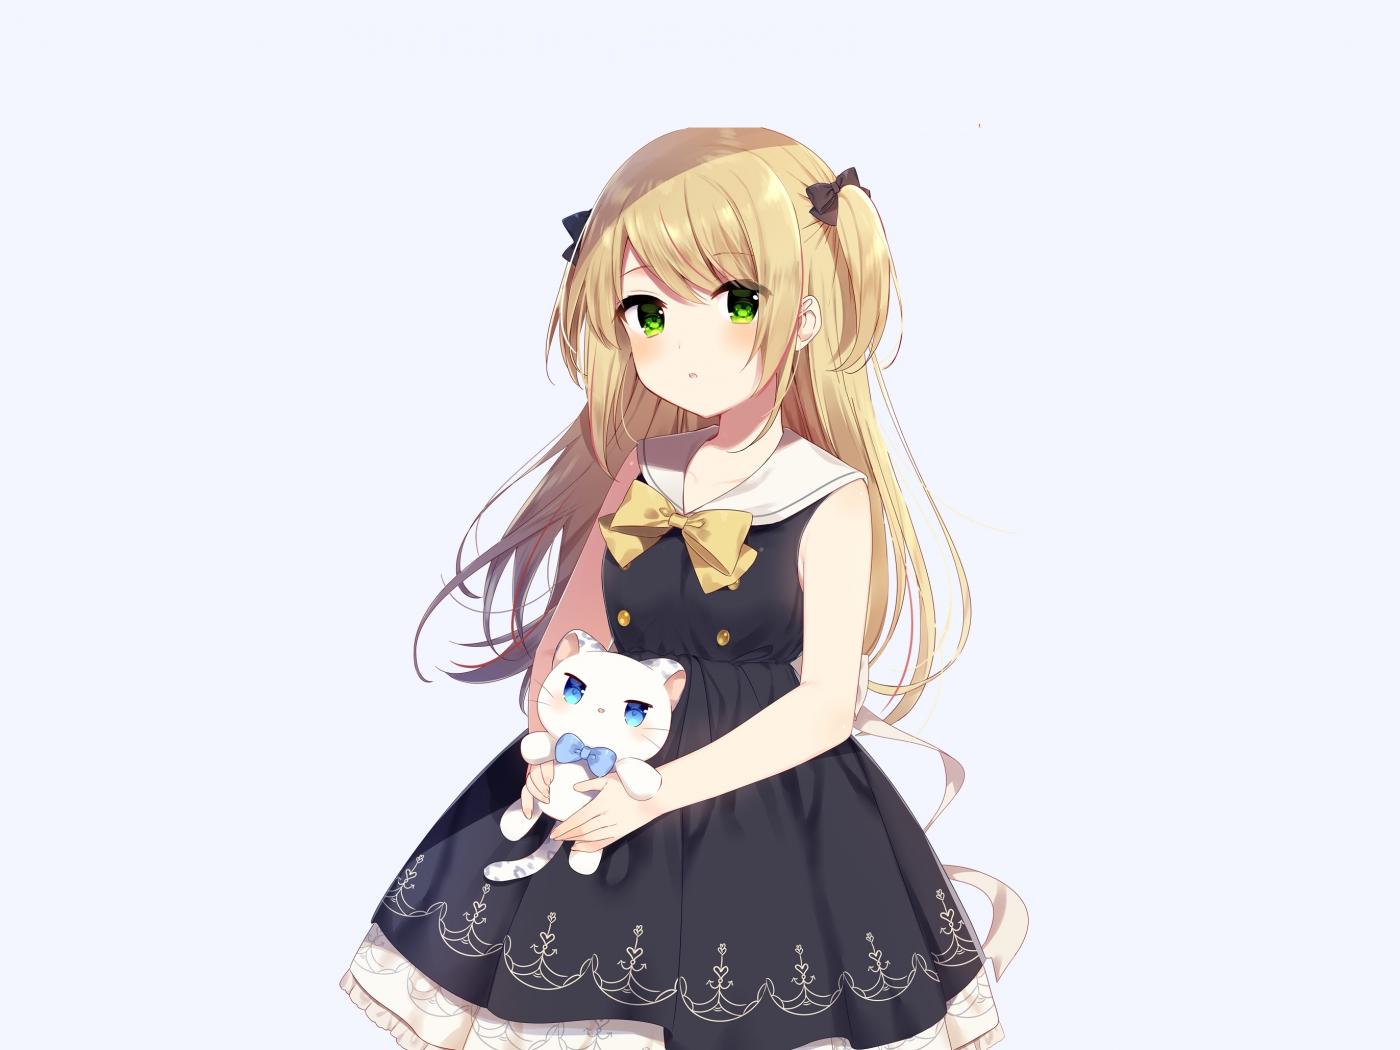 Cute anime girl and her kitten original 1400x1050 wallpaper